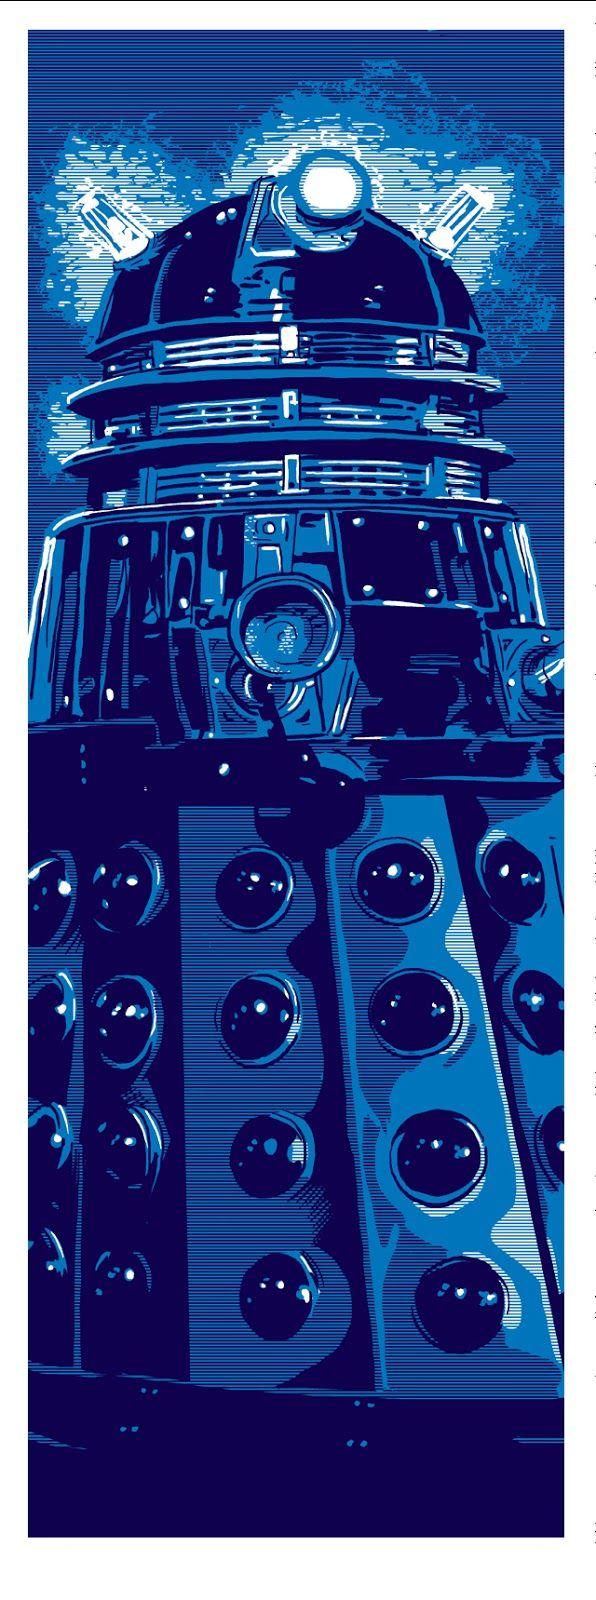 Doctor Who Dalek by Tim Doyle